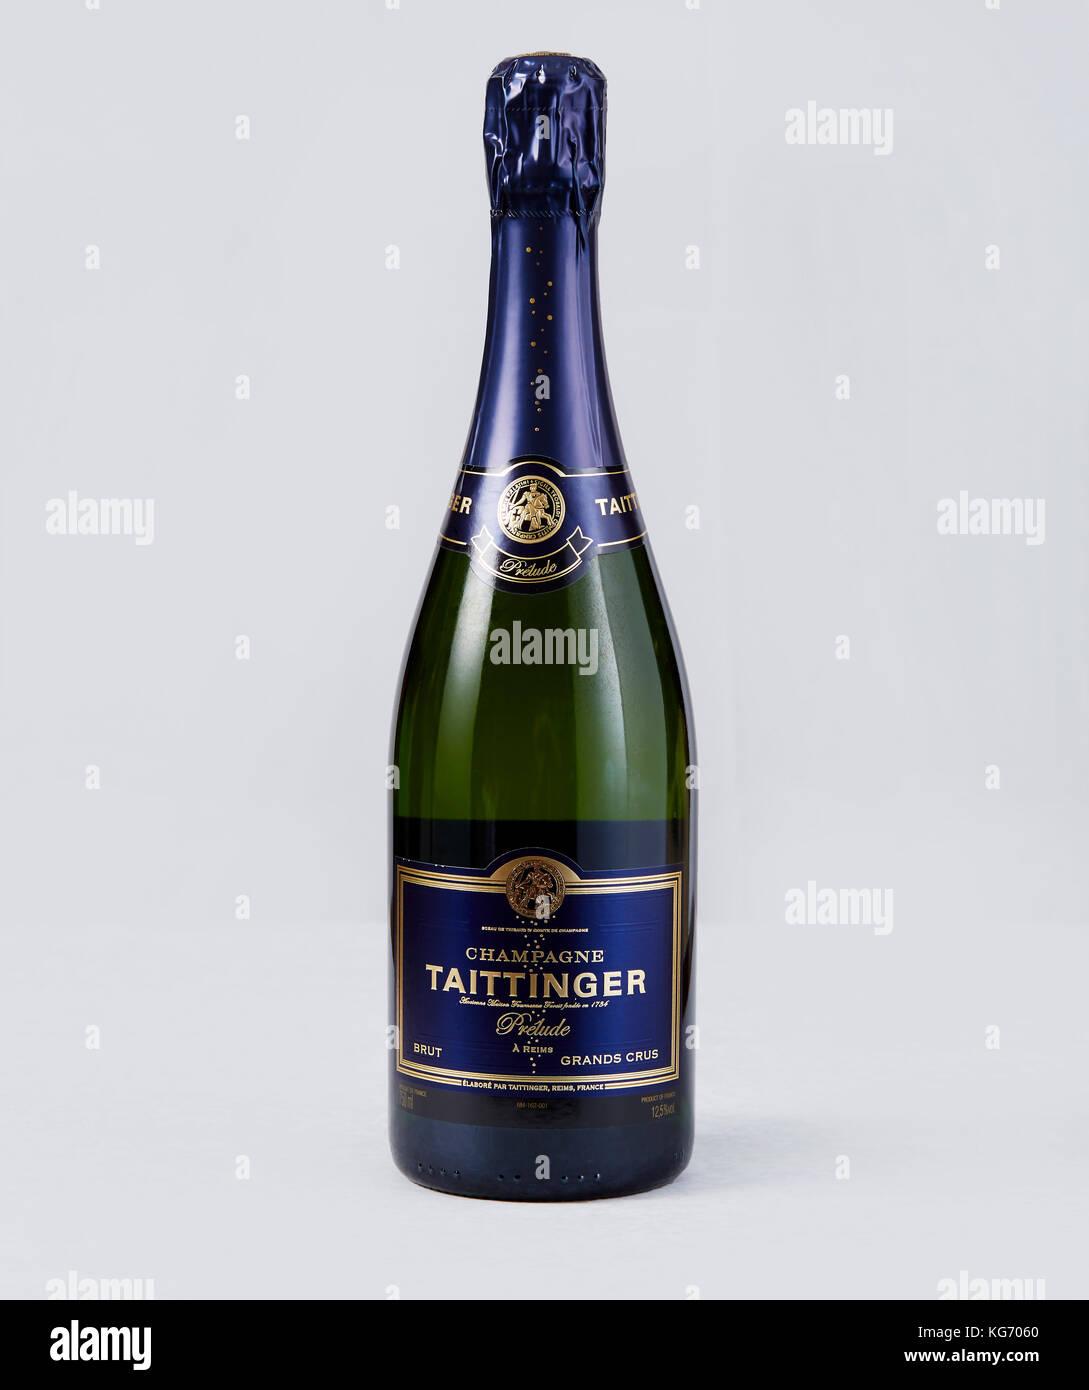 Bottle of Taittinger Champagne - Stock Image